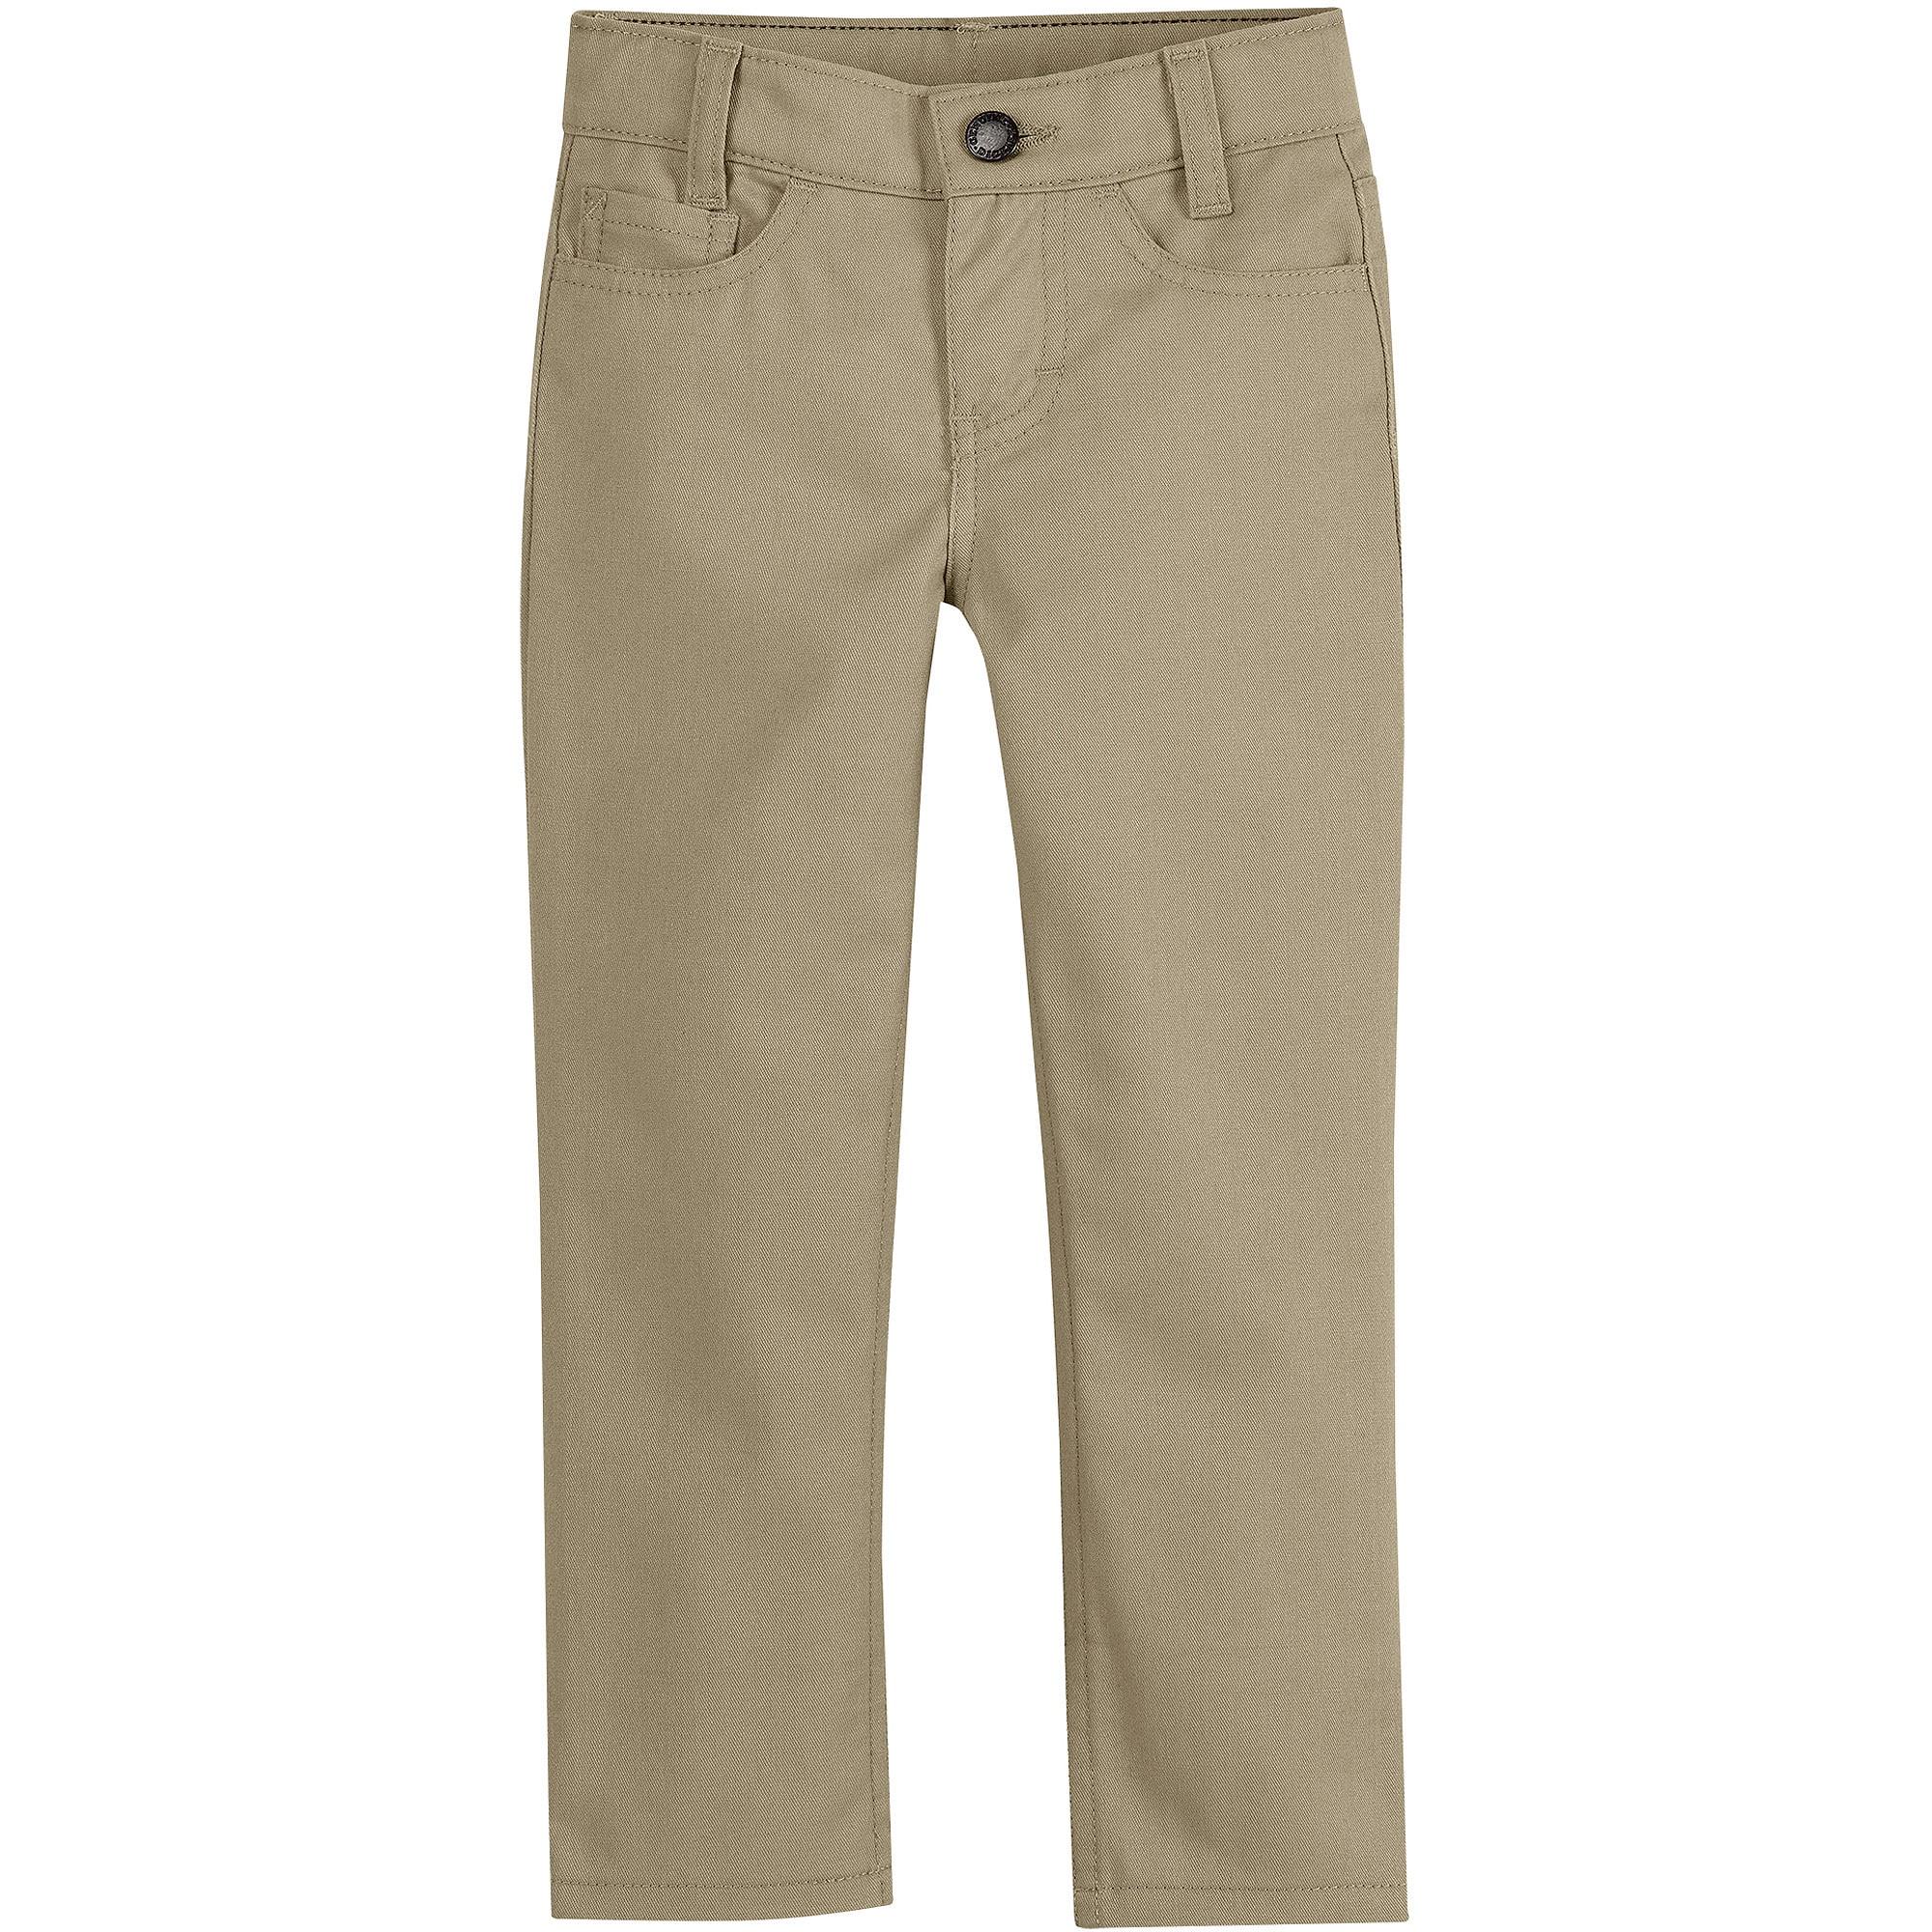 Toddler Boy Slim Skinny Pants